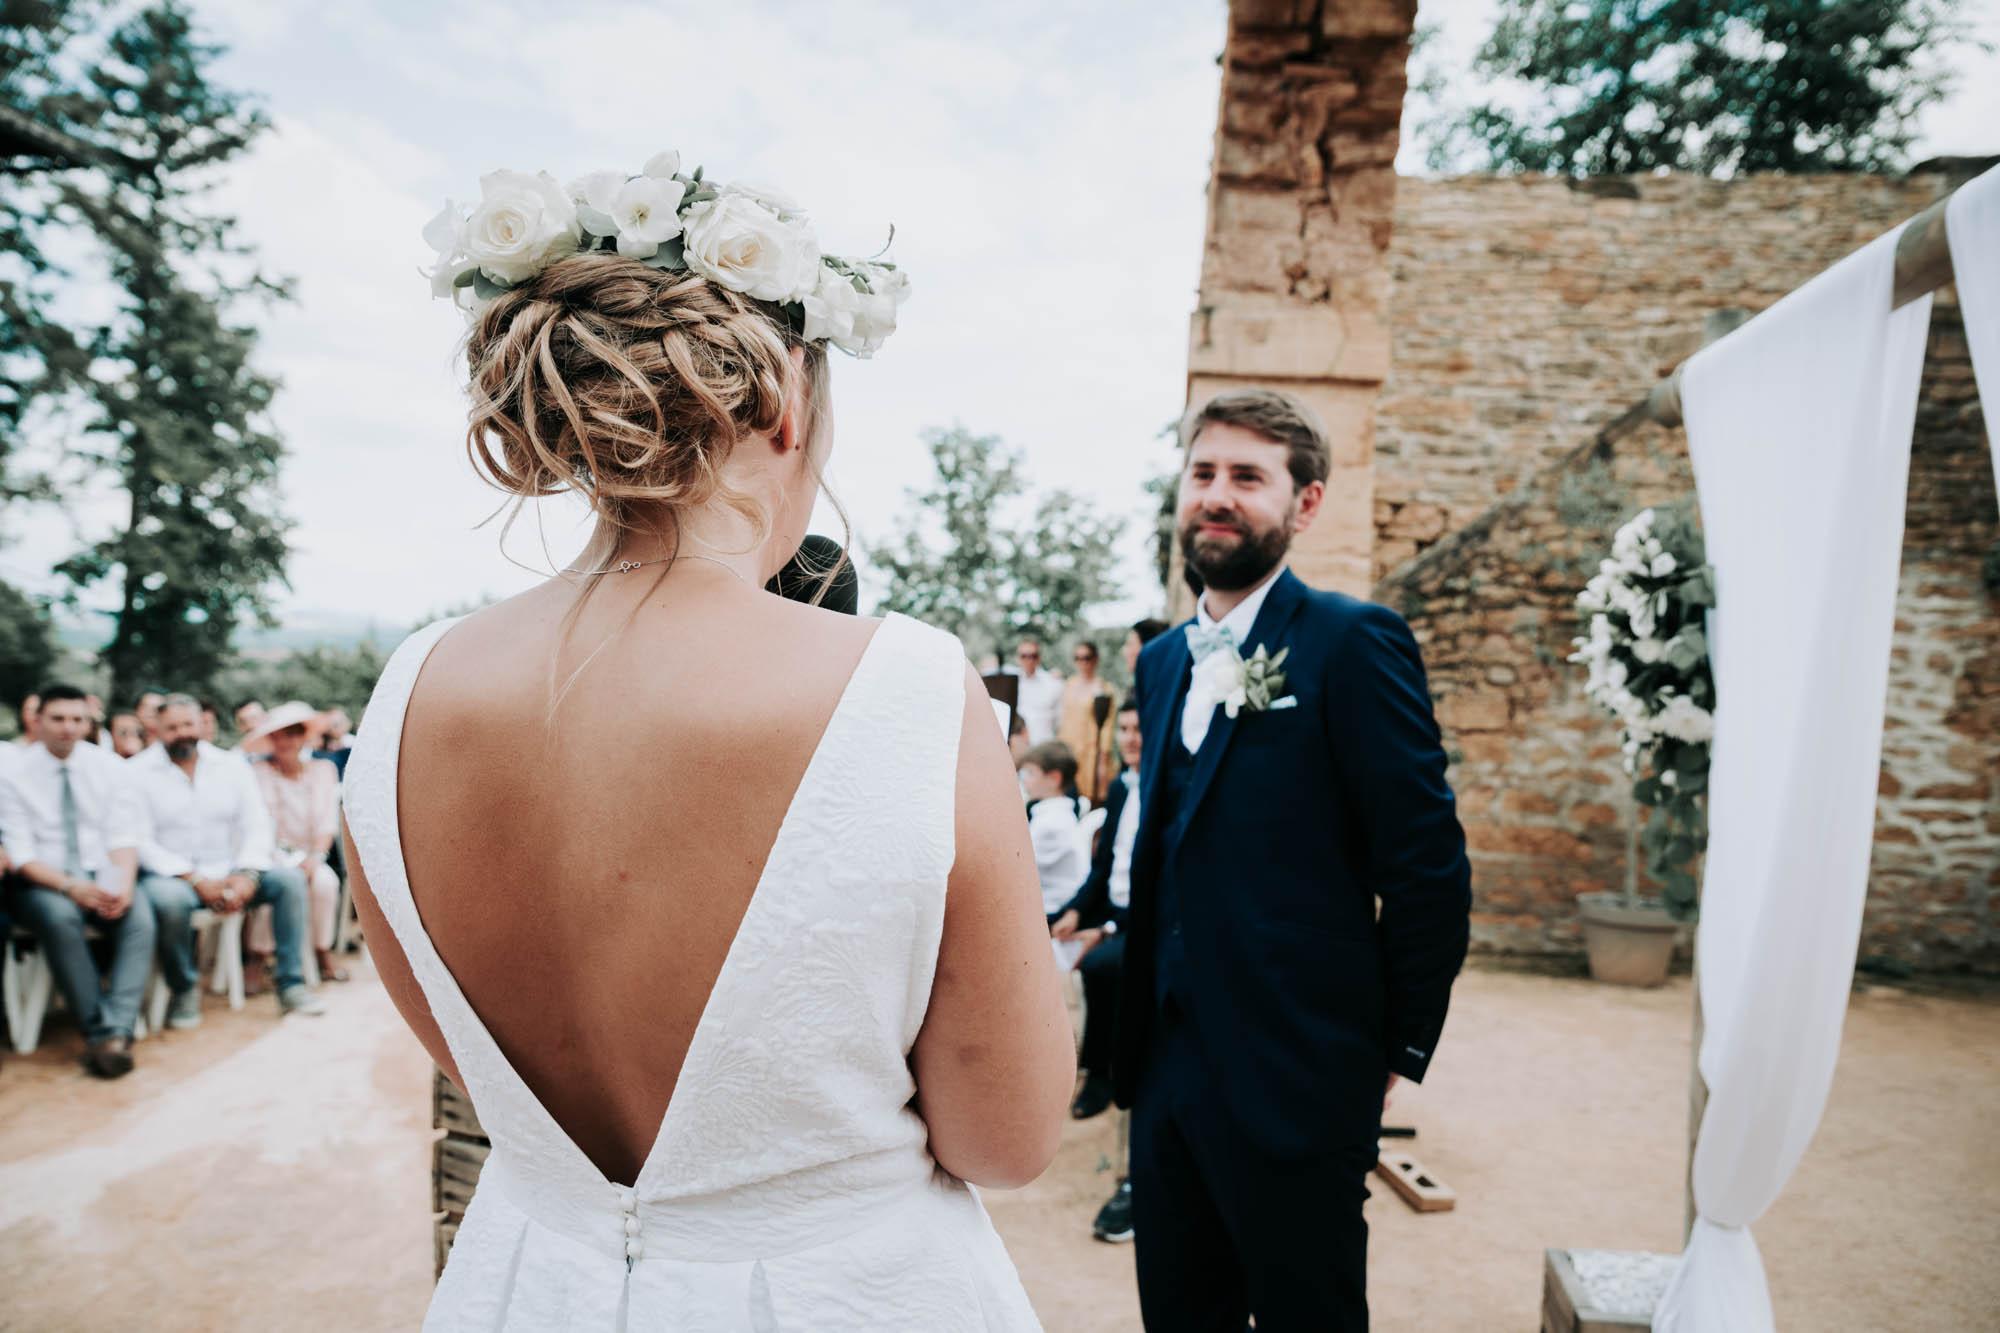 2018-07-21 - LD8_9989 - photographe mariage lyon - laurie diaz - www.lauriediazweeding.com.jpg